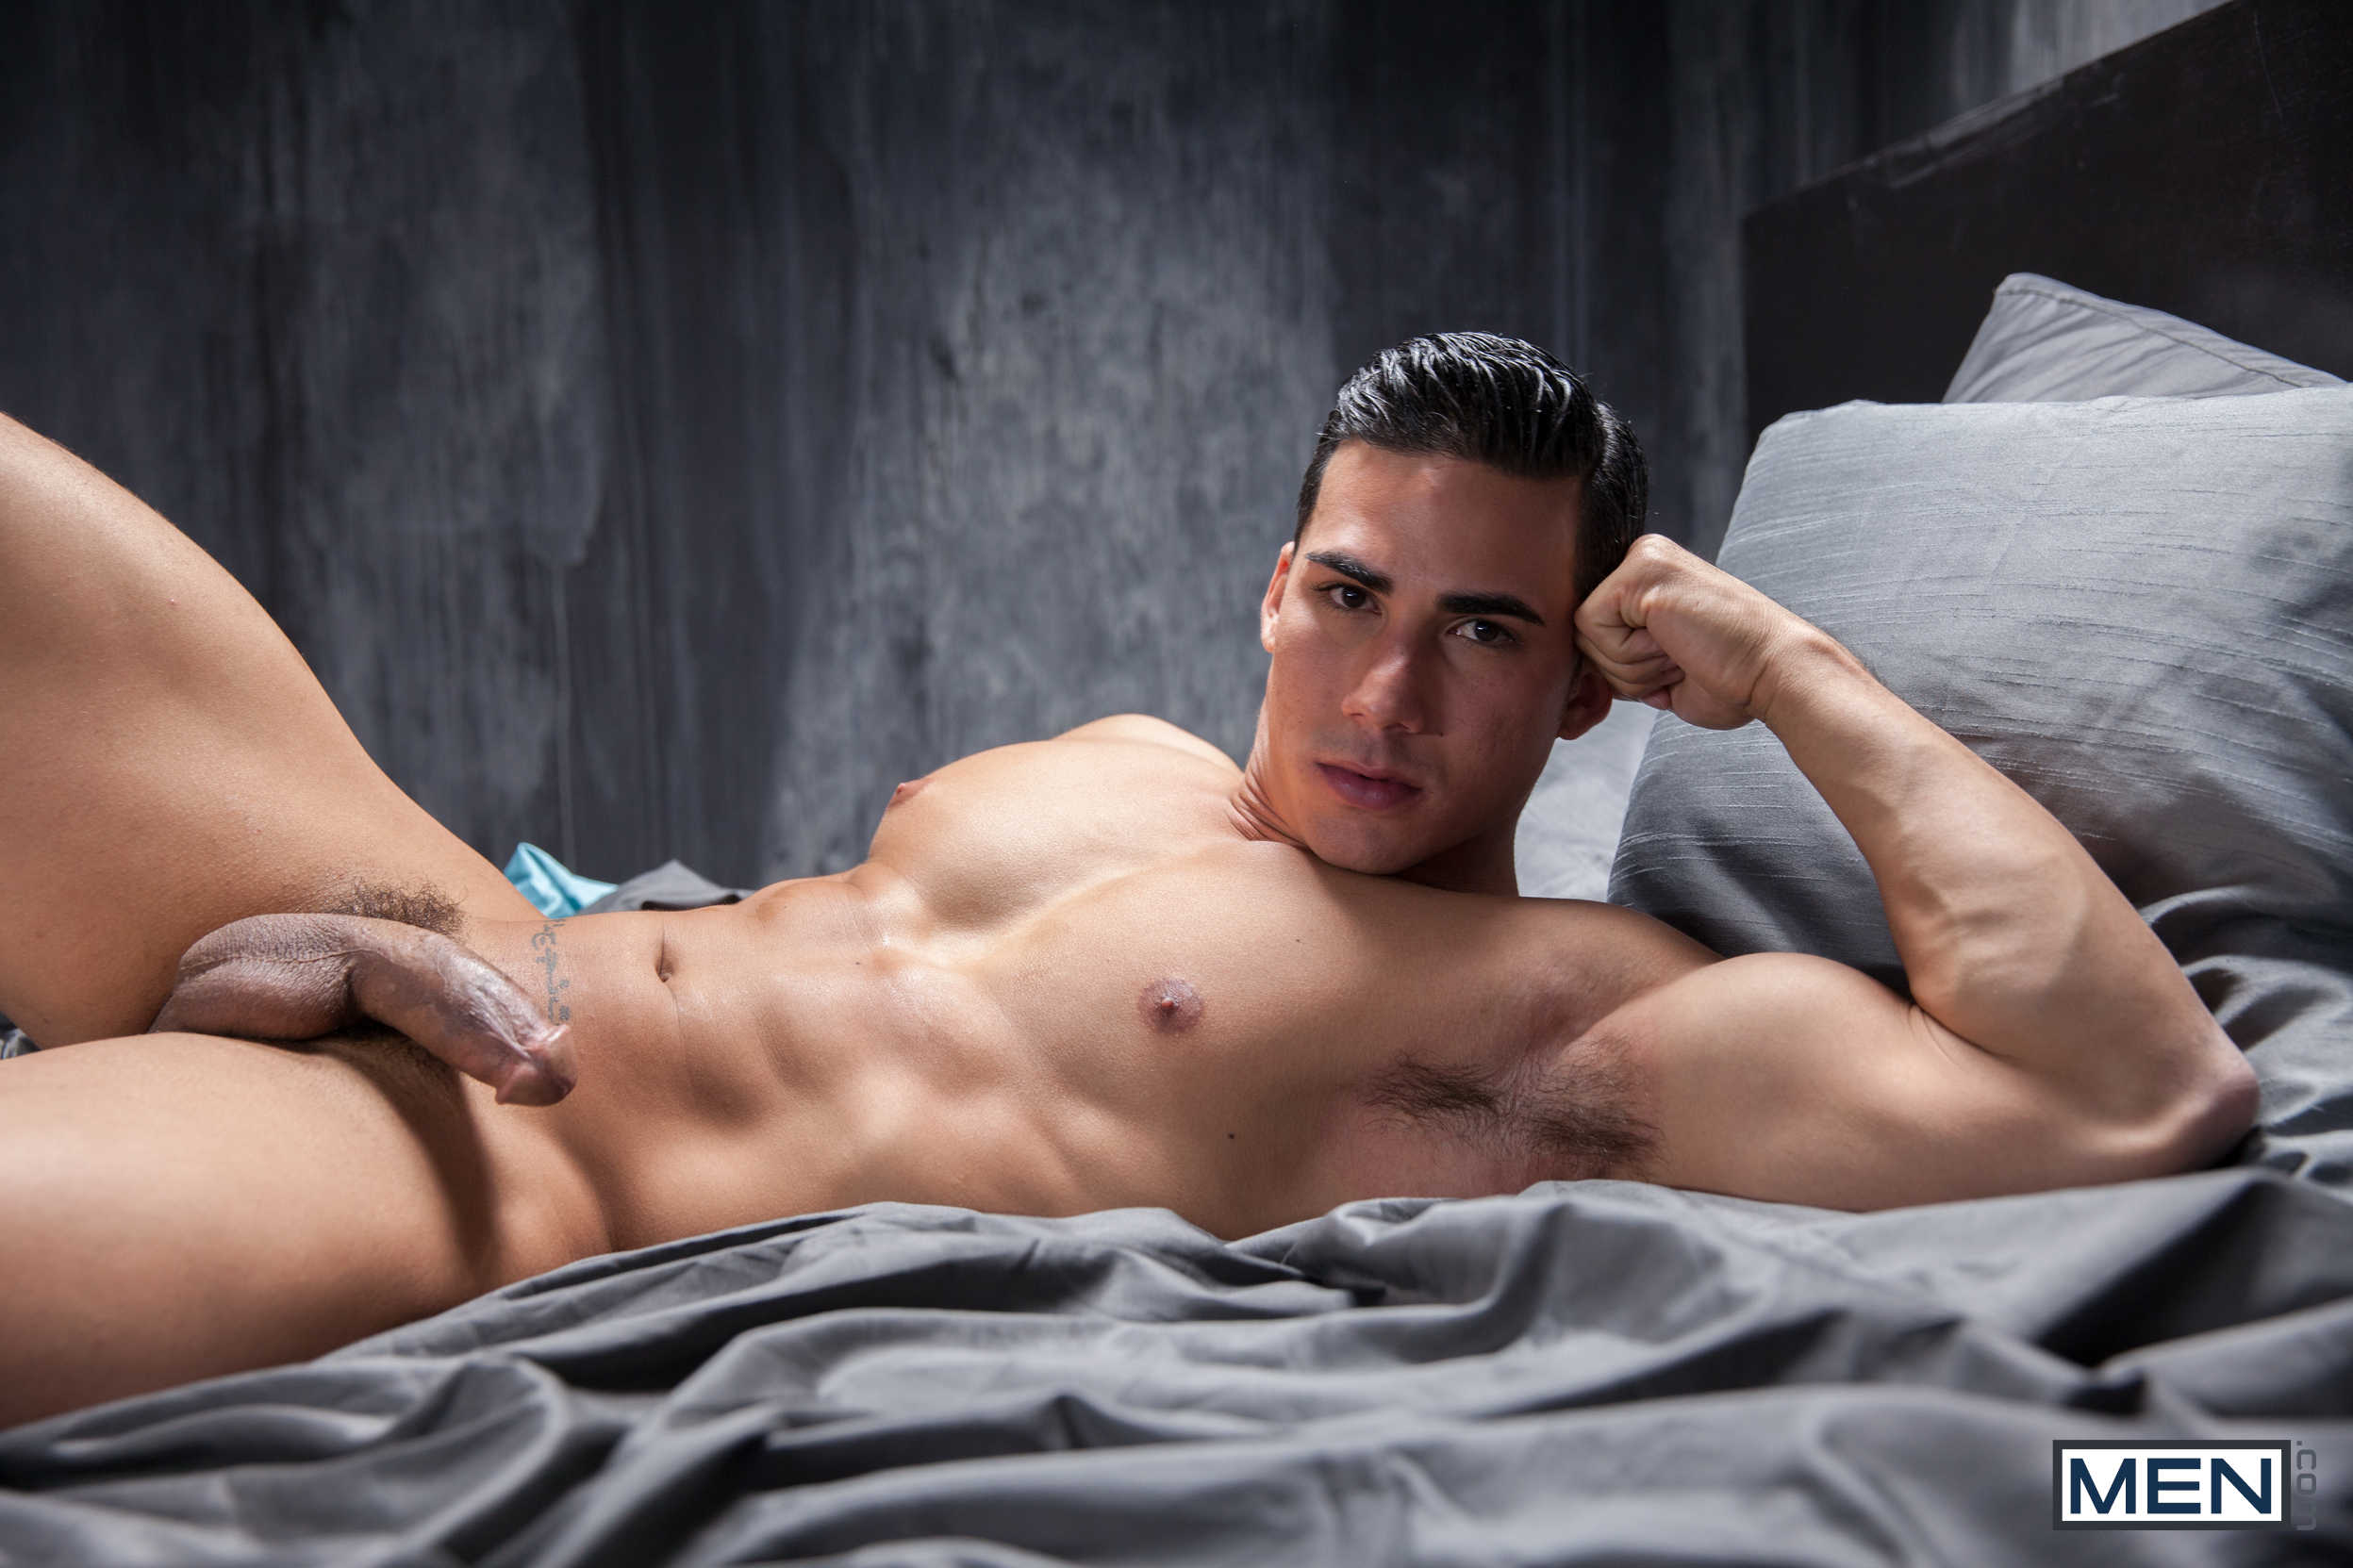 Passion Do Donato Reyes Porn showing xxx images for donato reyes porn xxx | www.fuckpix.club